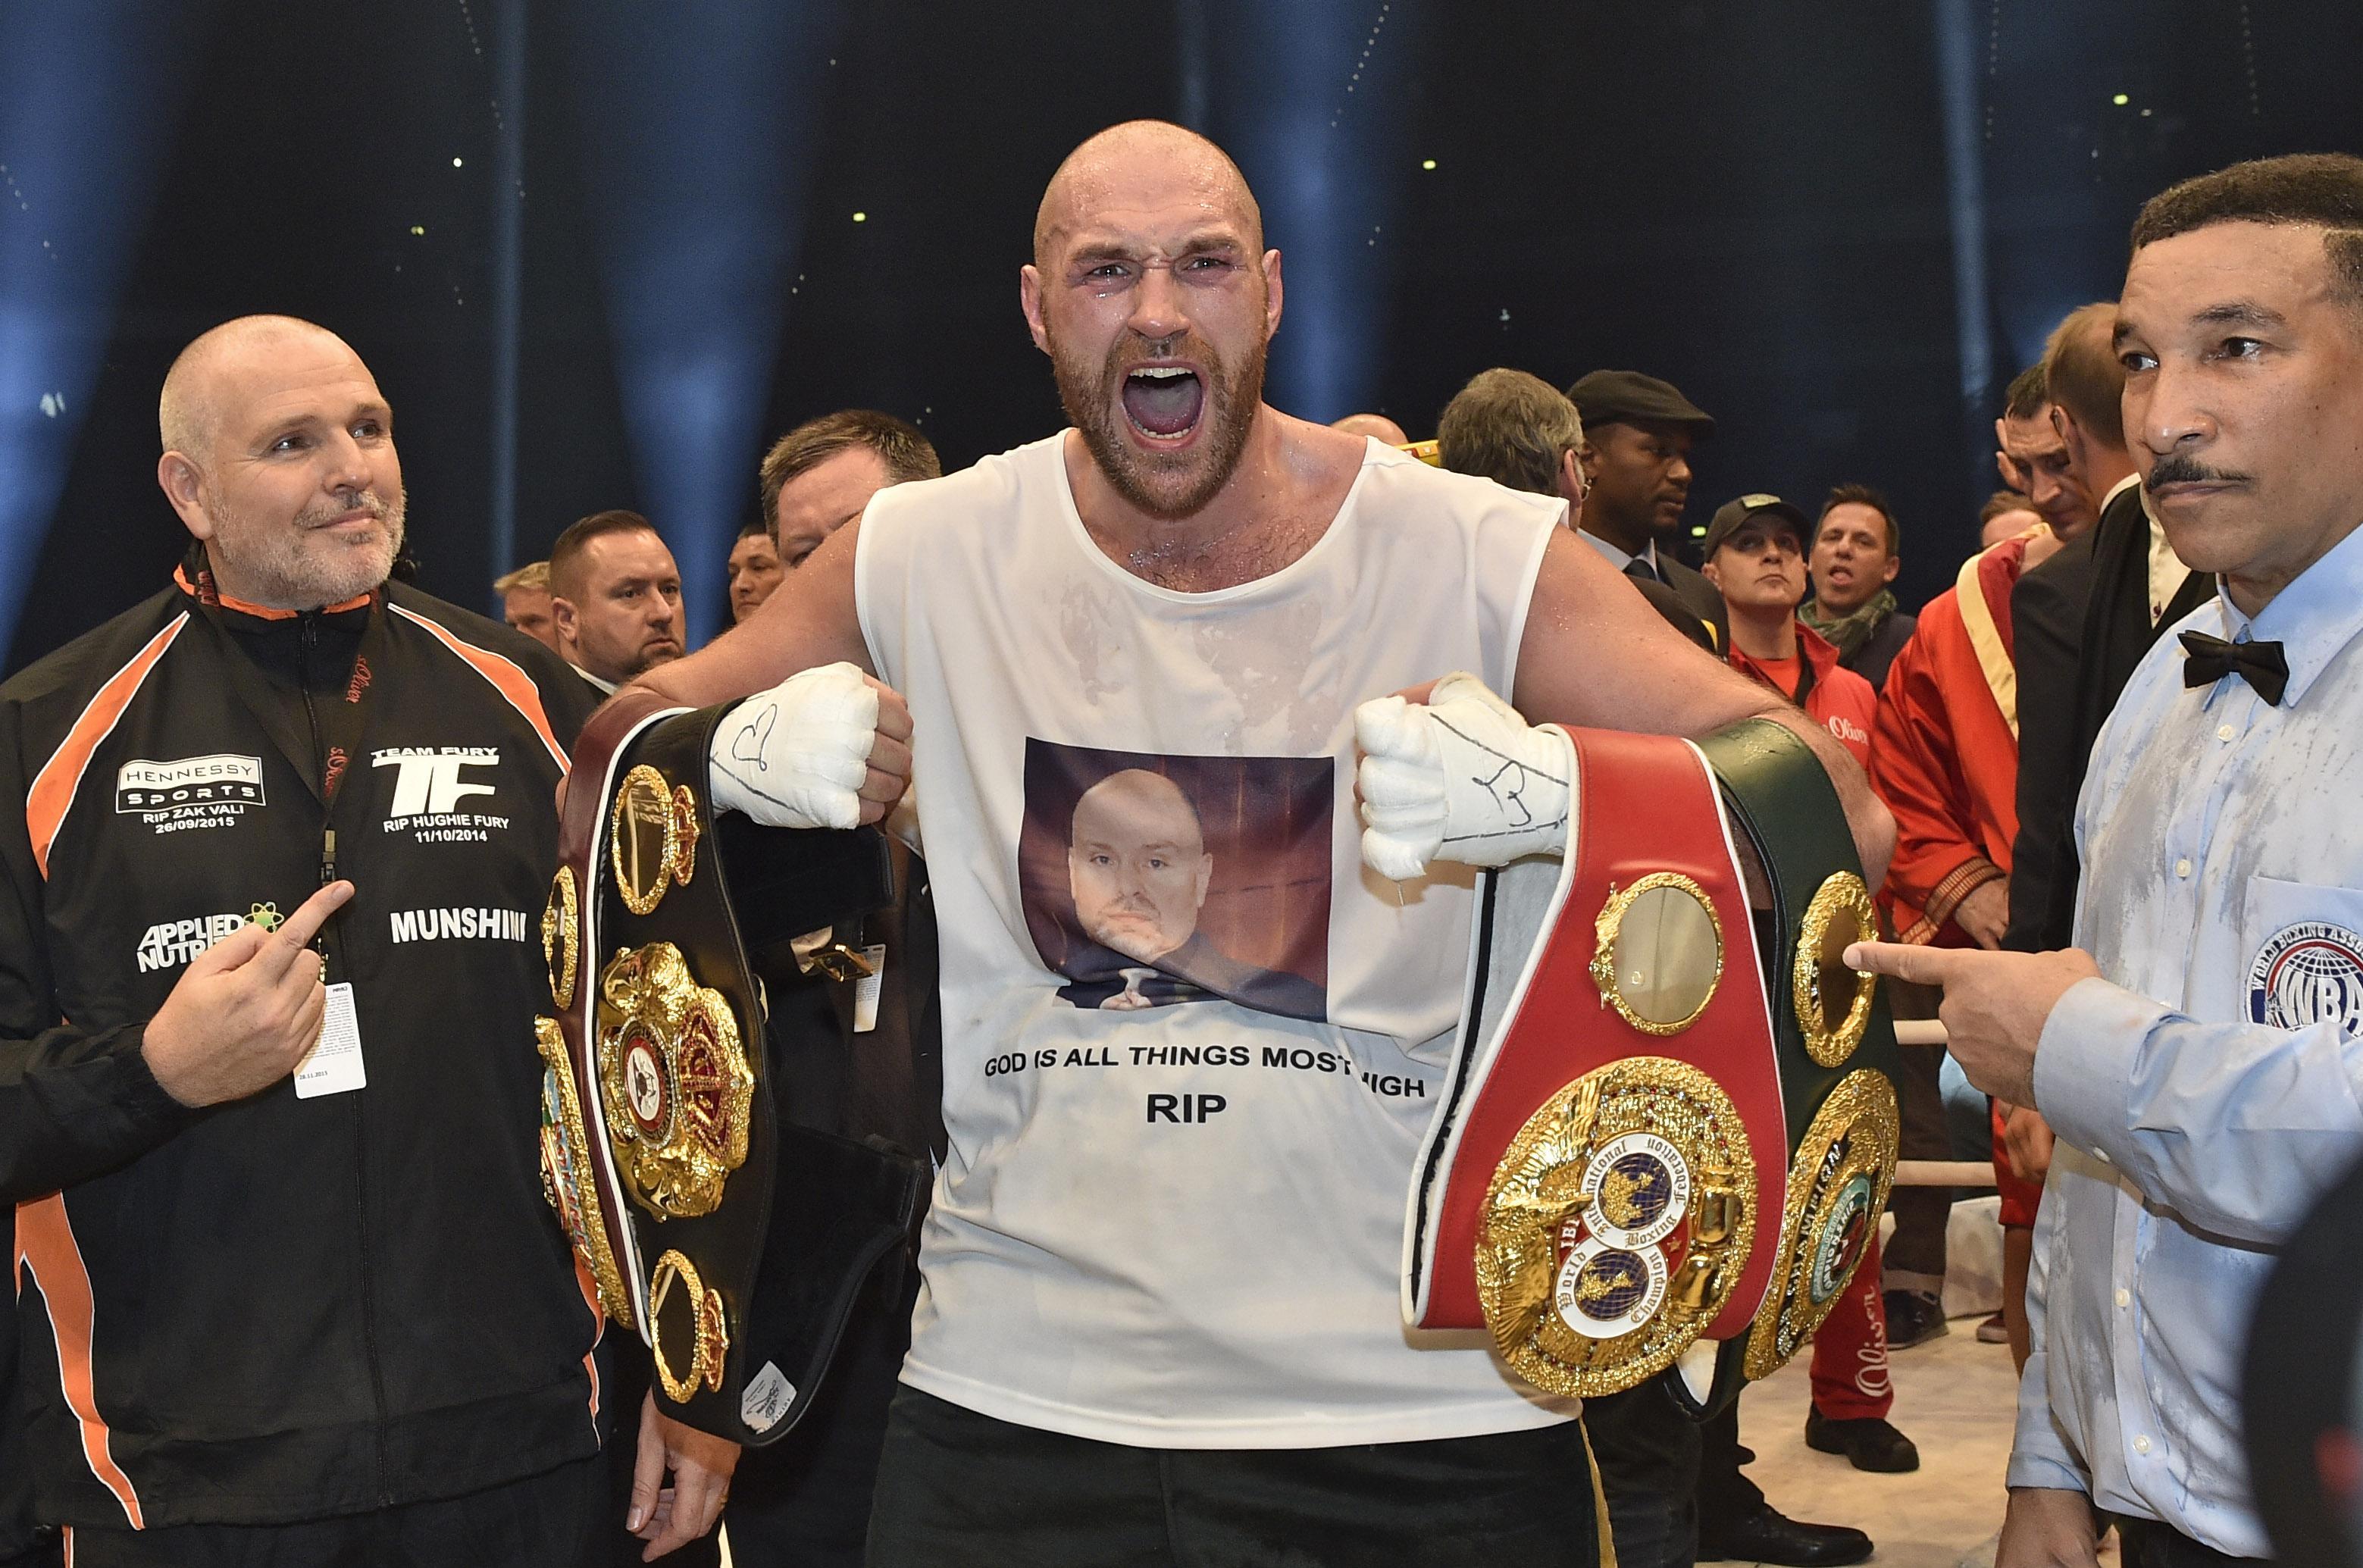 Tyson Fury ends Wladimir Klitschko's heavyweight reign | The